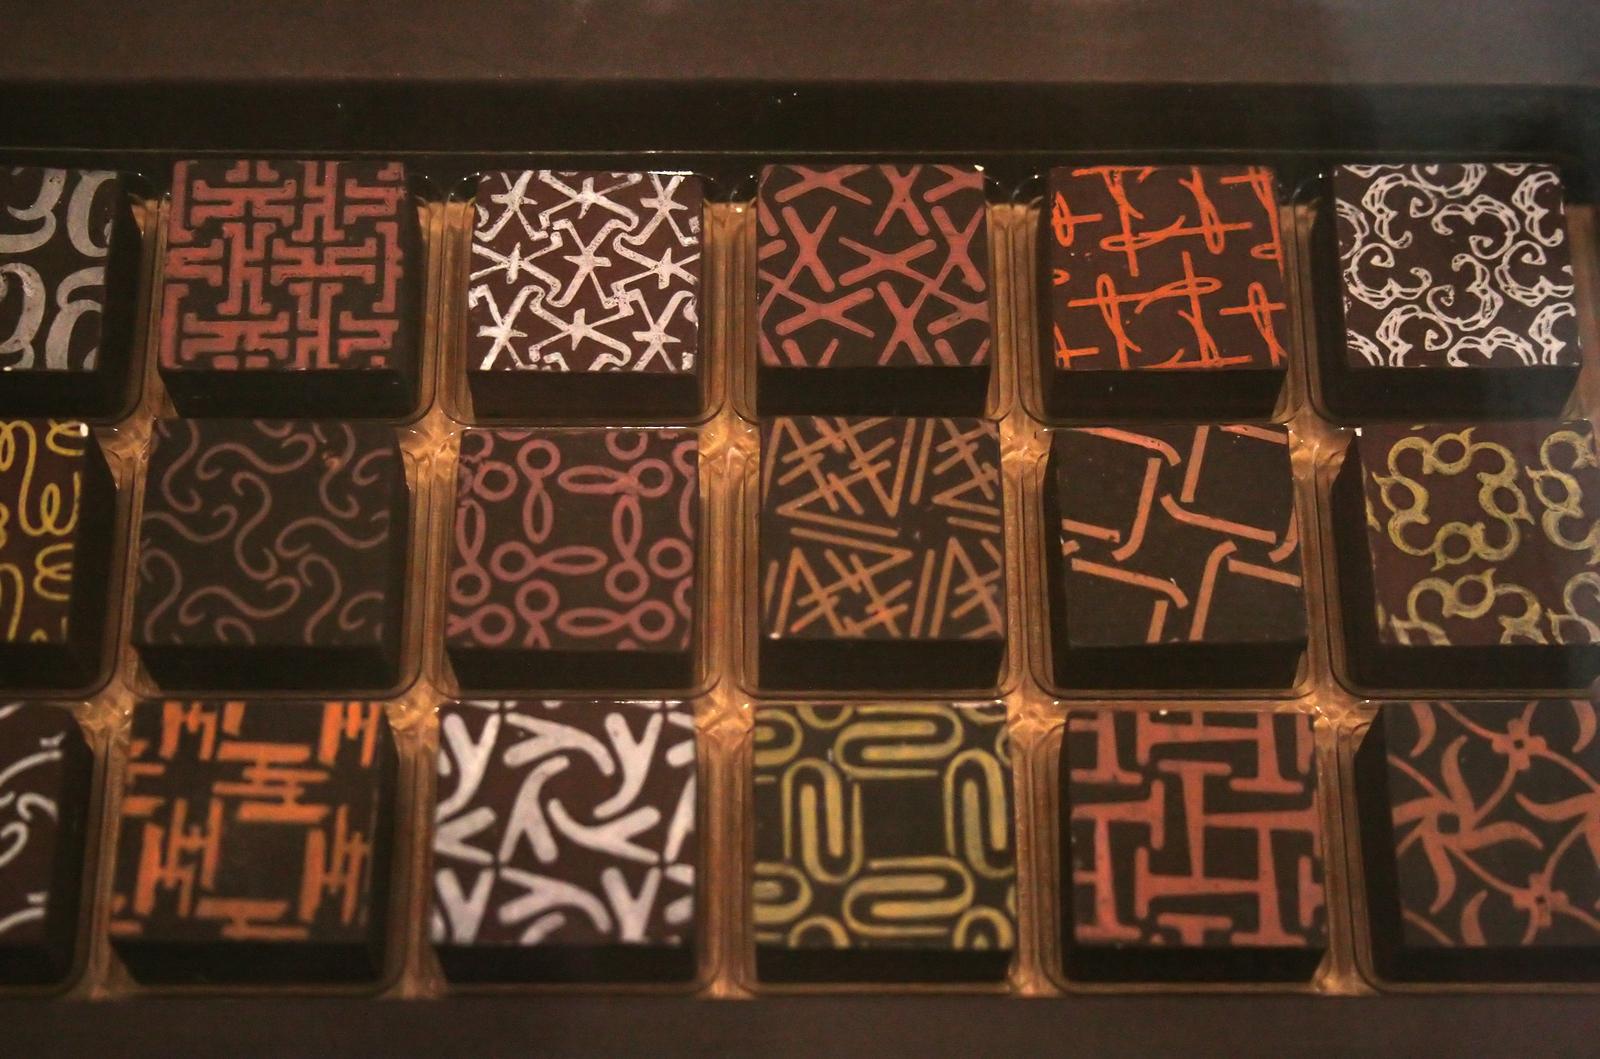 The best artisan chocolates around : Sierra FoodWineArt: A ...